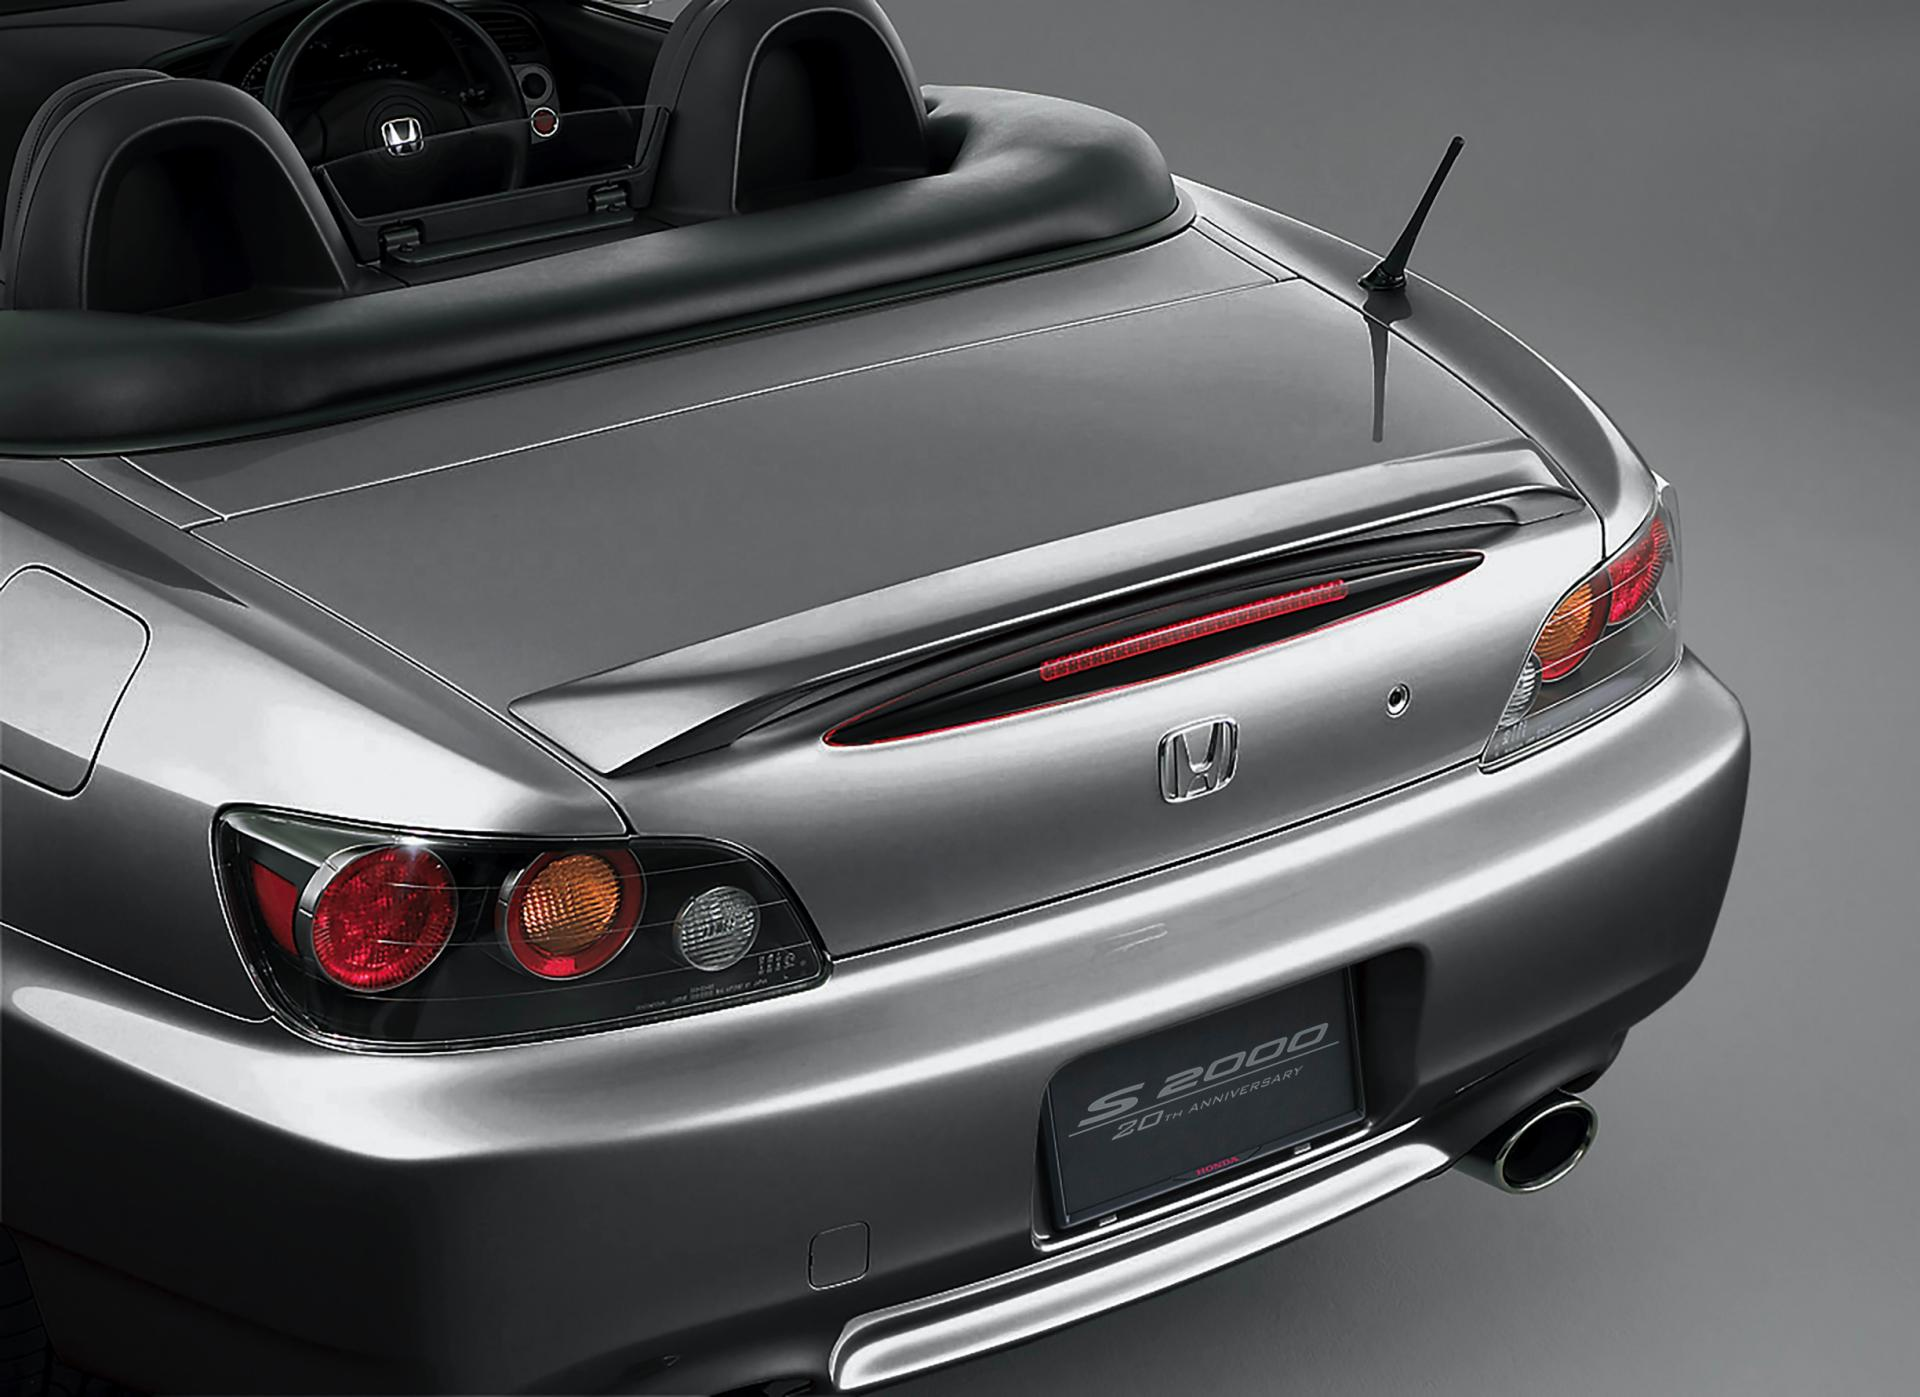 Honda-S2000-20th-Anniversary-genuine-accessories-11